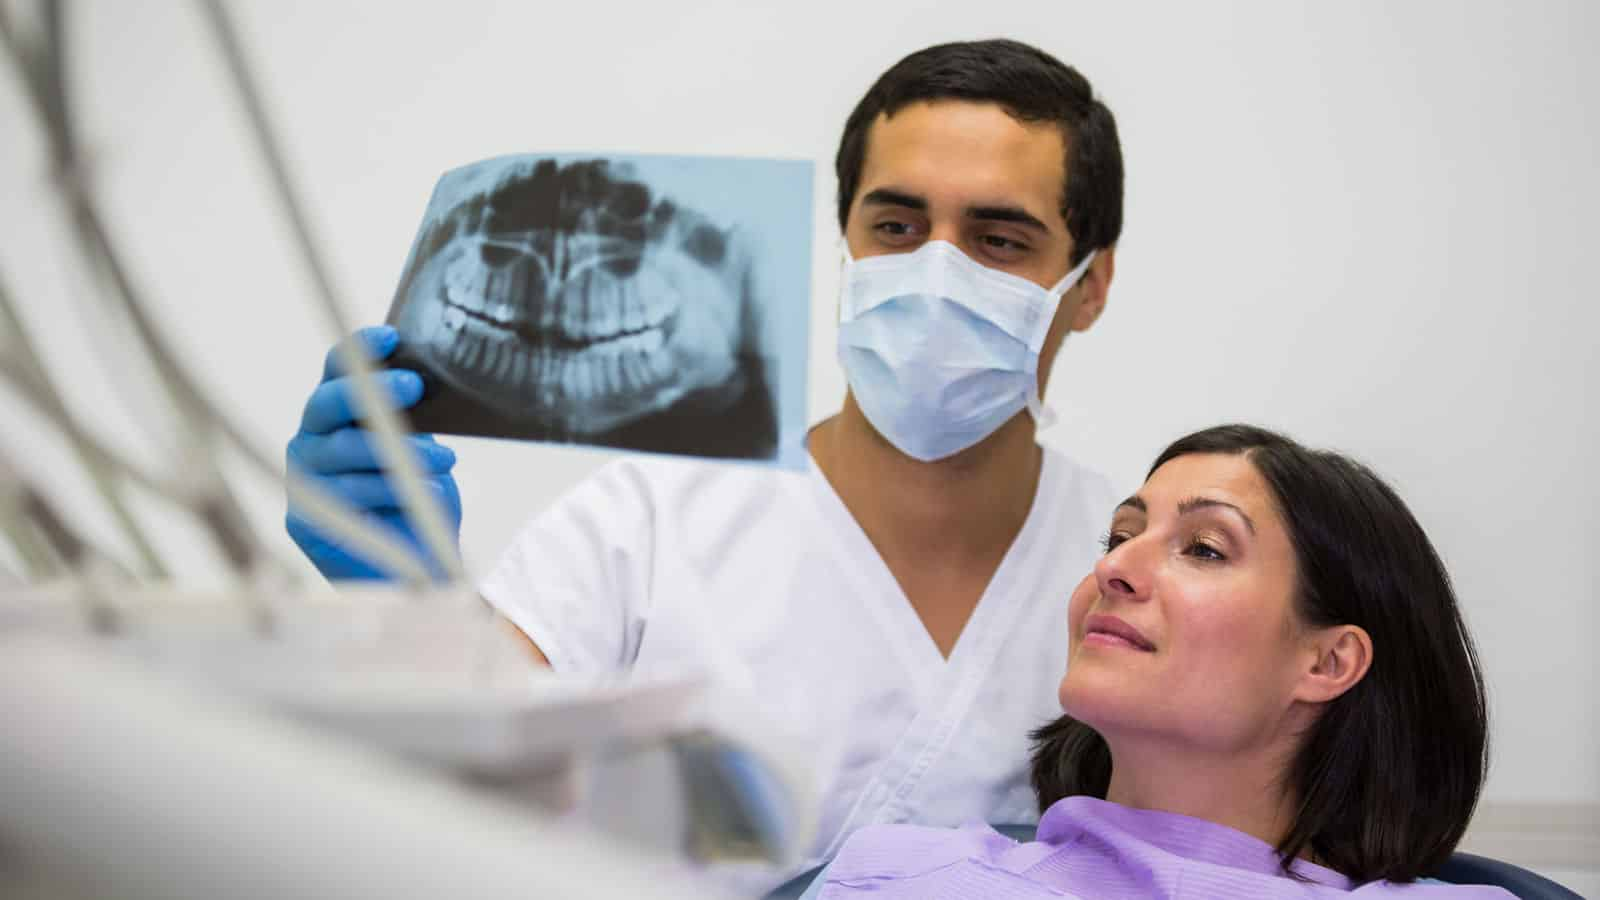 North Pointe Dental Associates of Tampa